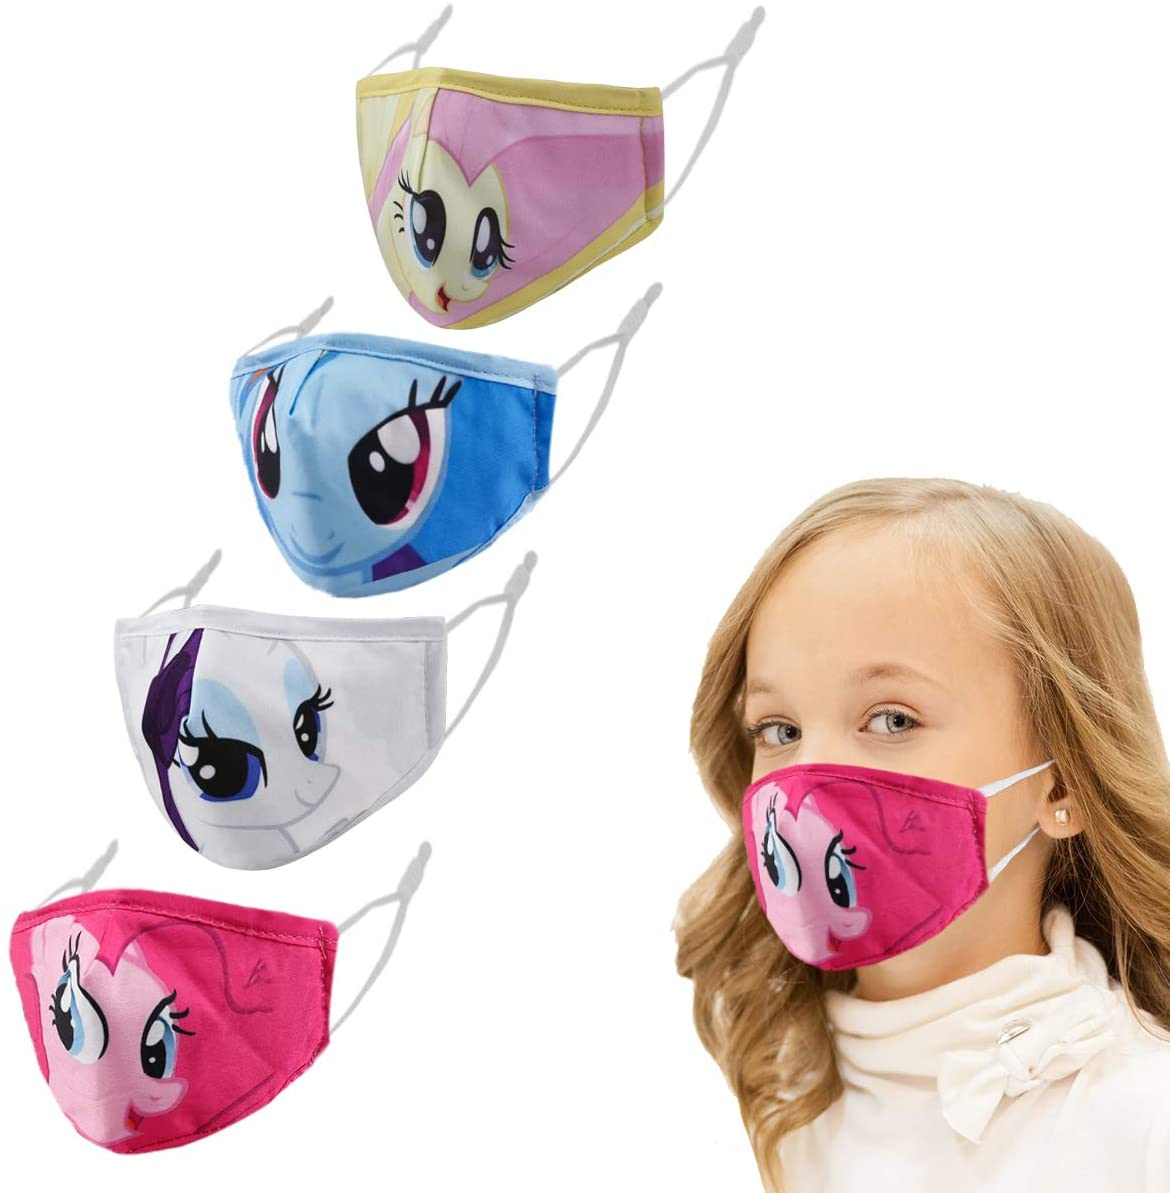 Woplagyreat 4 Pcs Face Cloth Masks for Kids, Comfortable Protective Cute Masks, Reusable & Washable